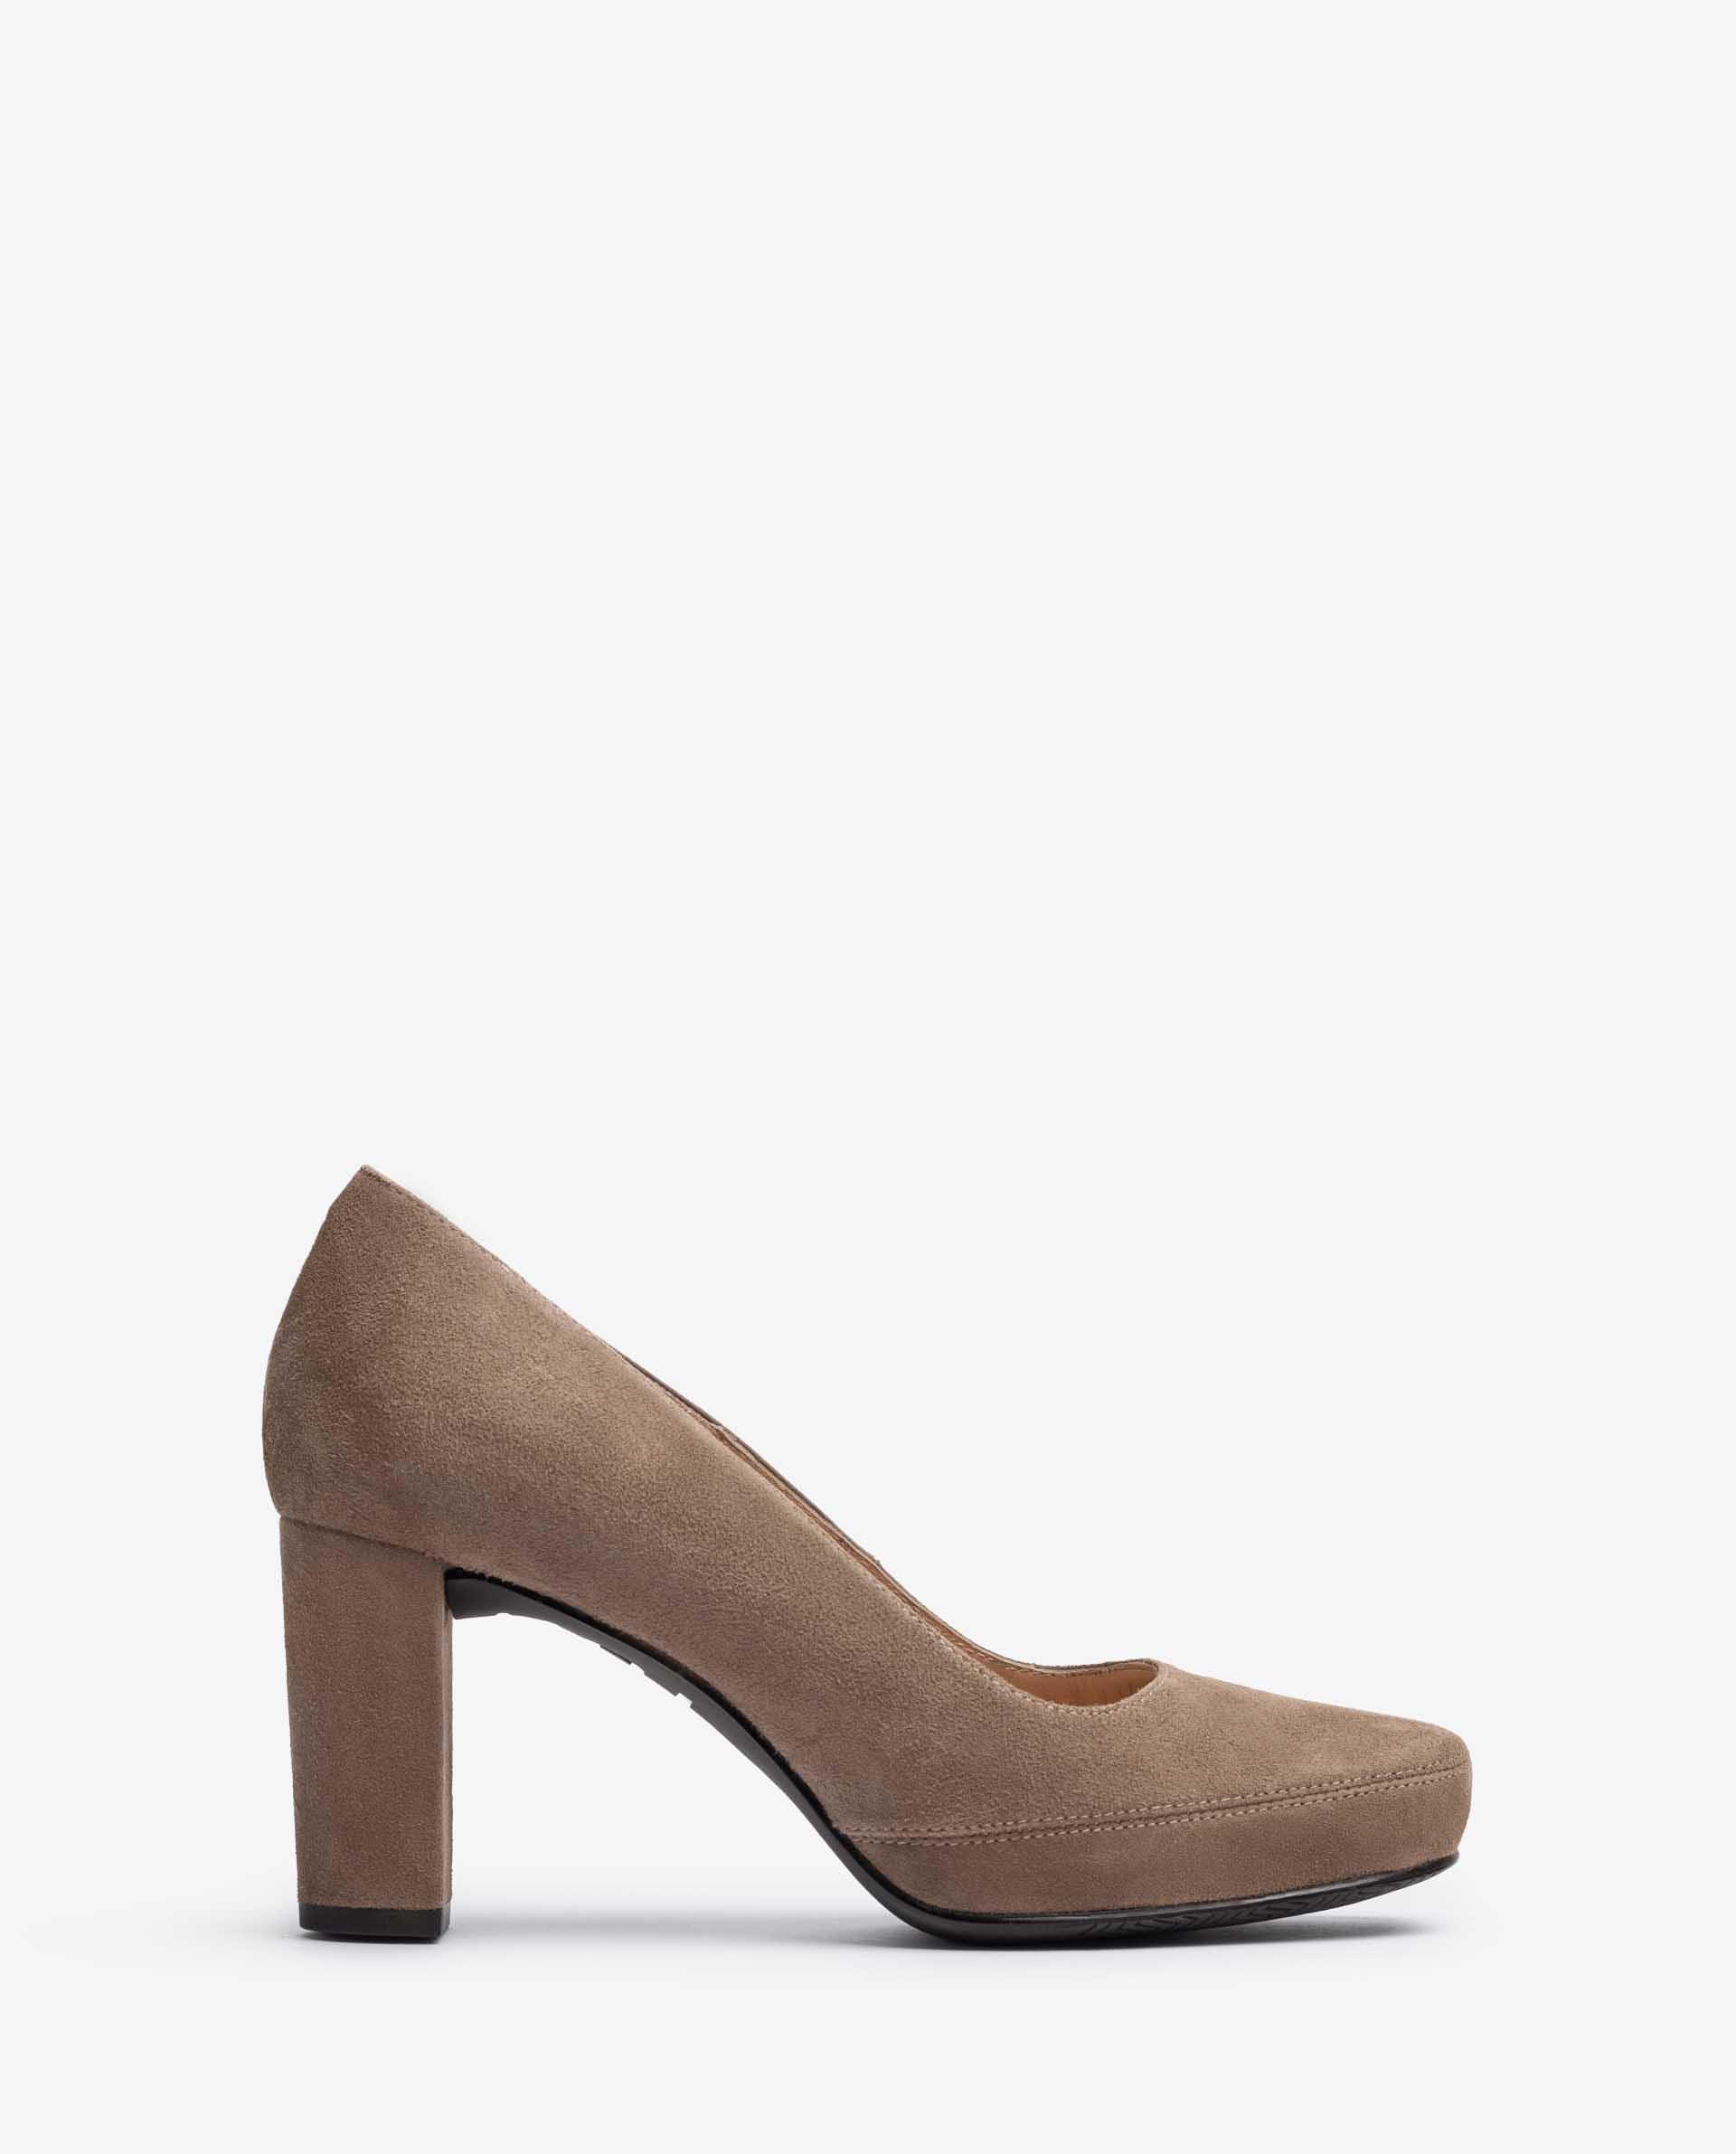 Unisa Zapatos de salón NARCY_KS taupe